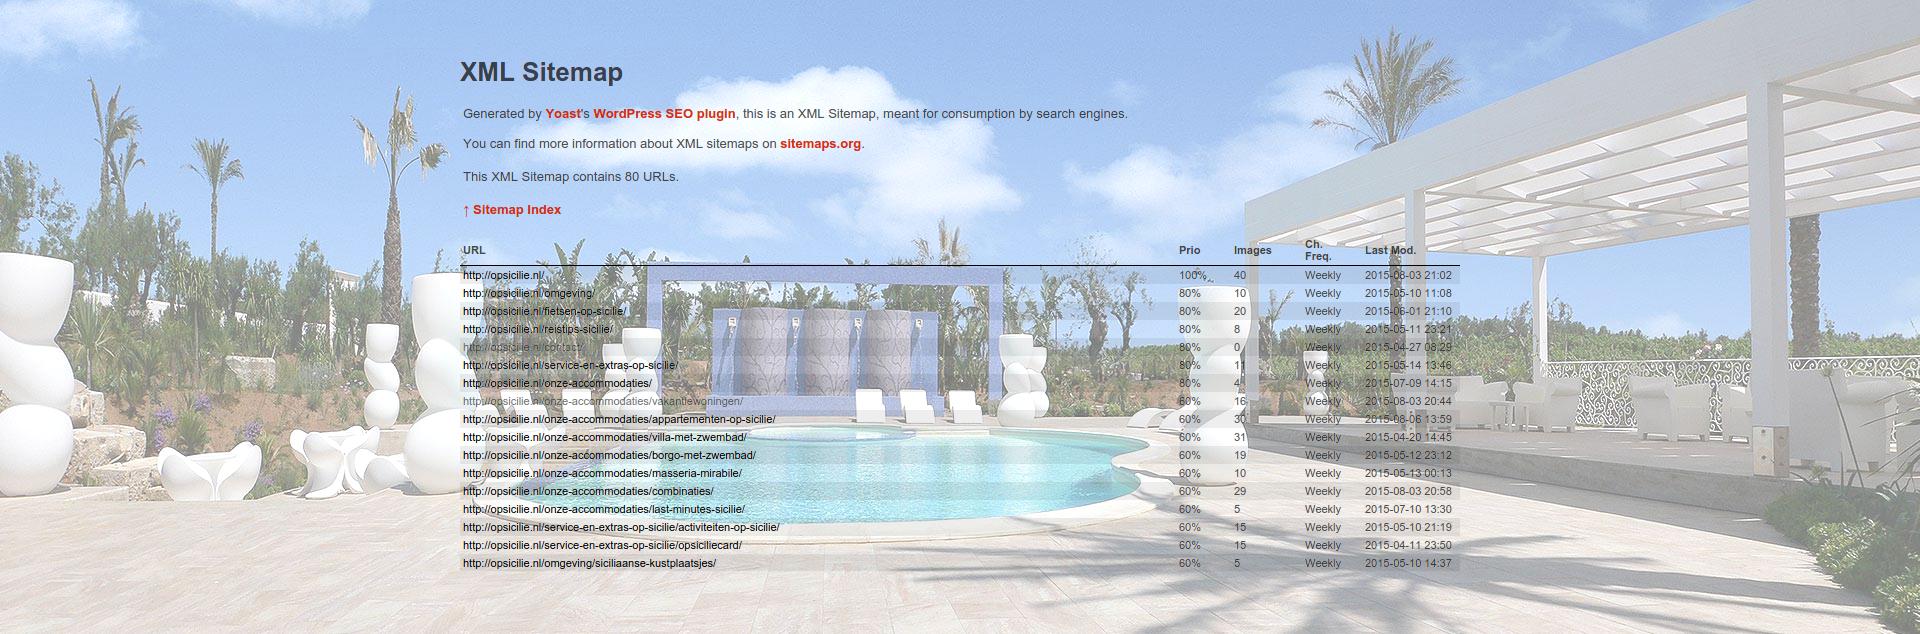 mp yoast seo include images premium addon webshop mijnpress nl